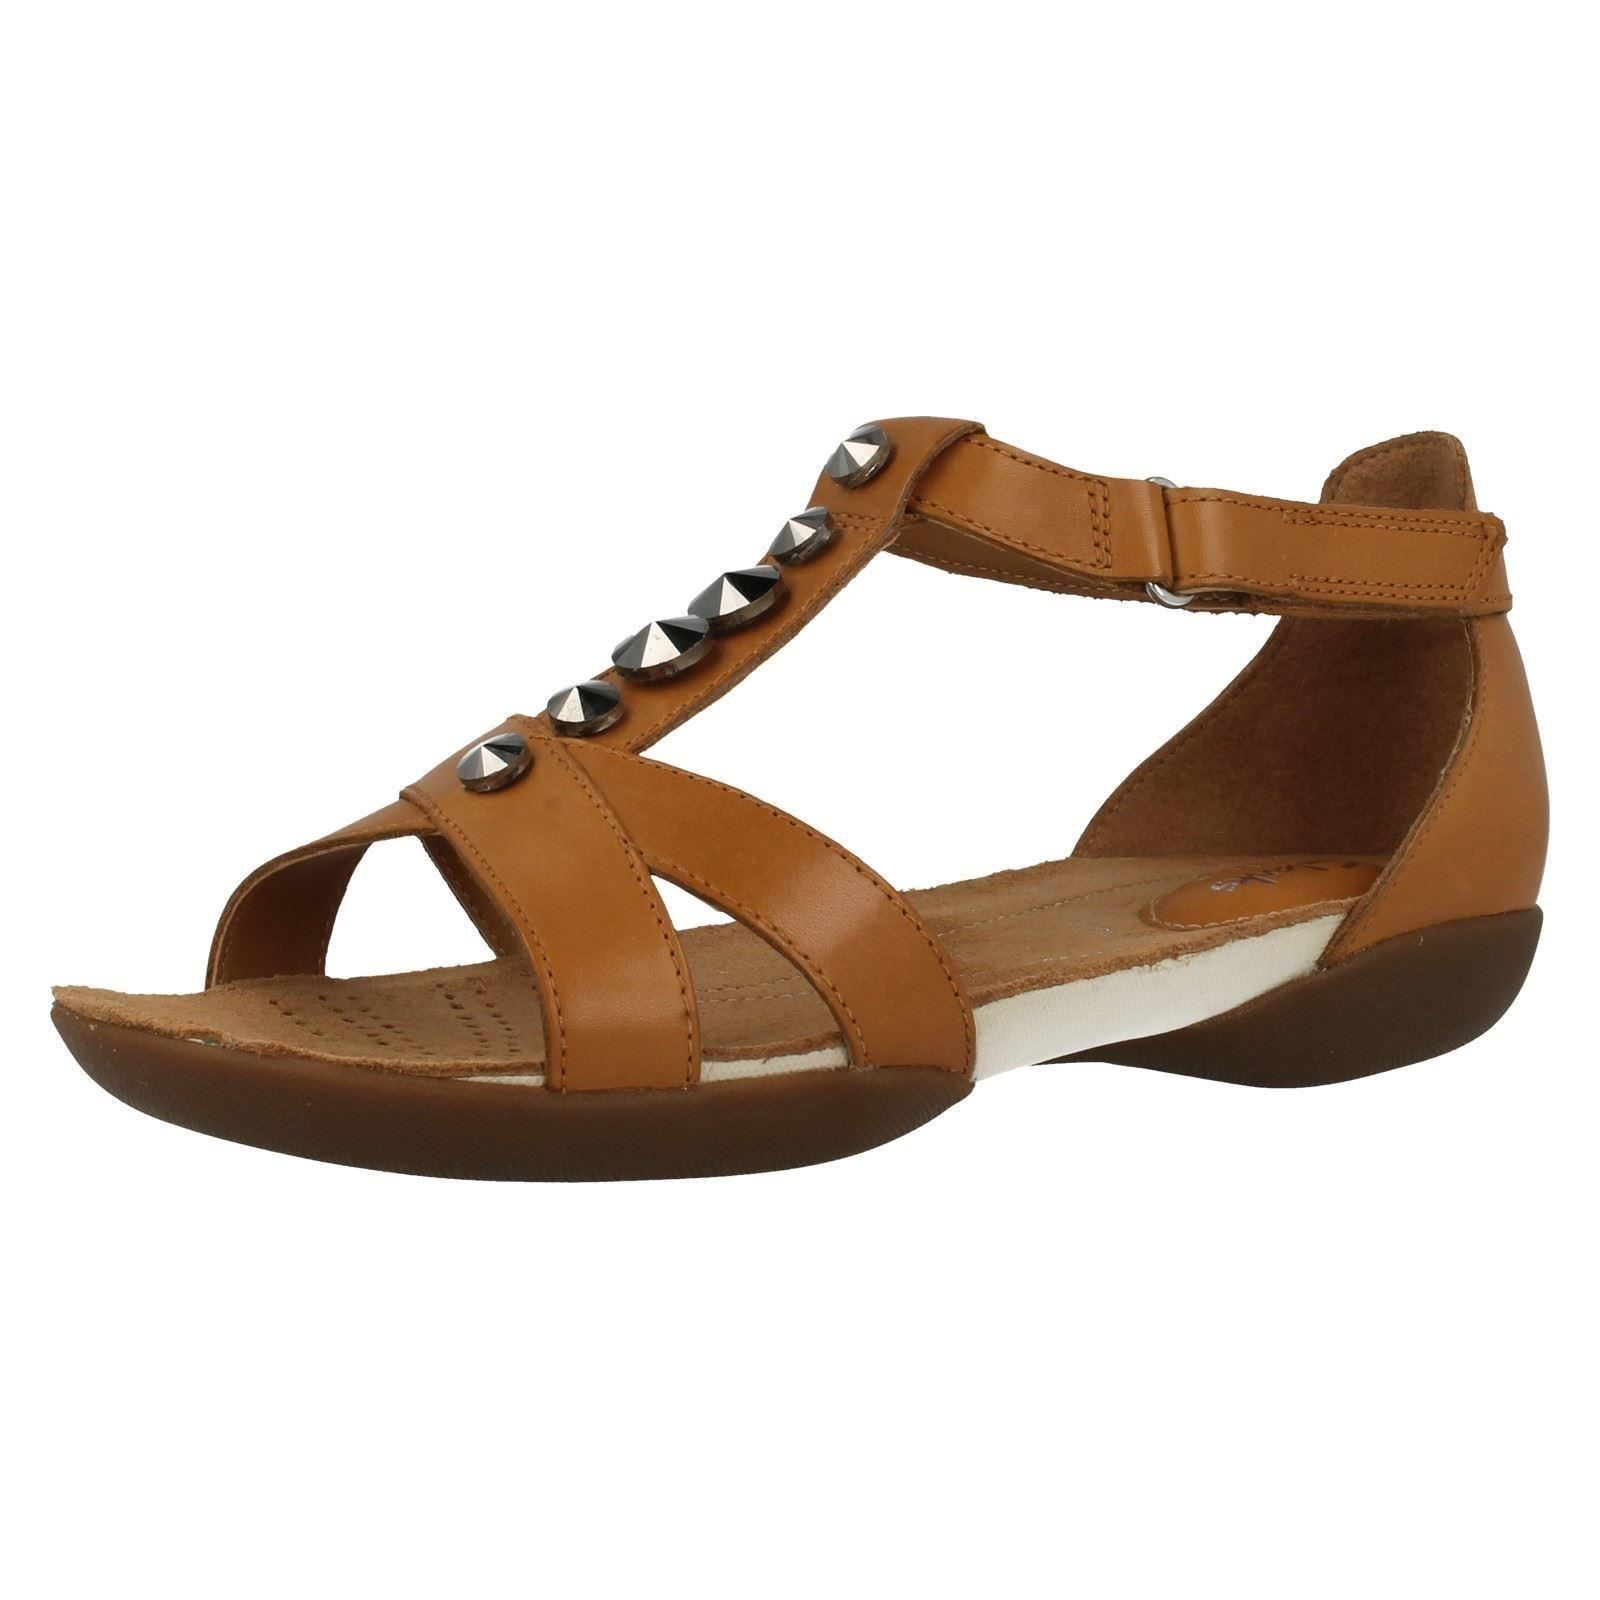 e013552992f1 Aerosole Sandals  Clarks Sandals Raffi Scent